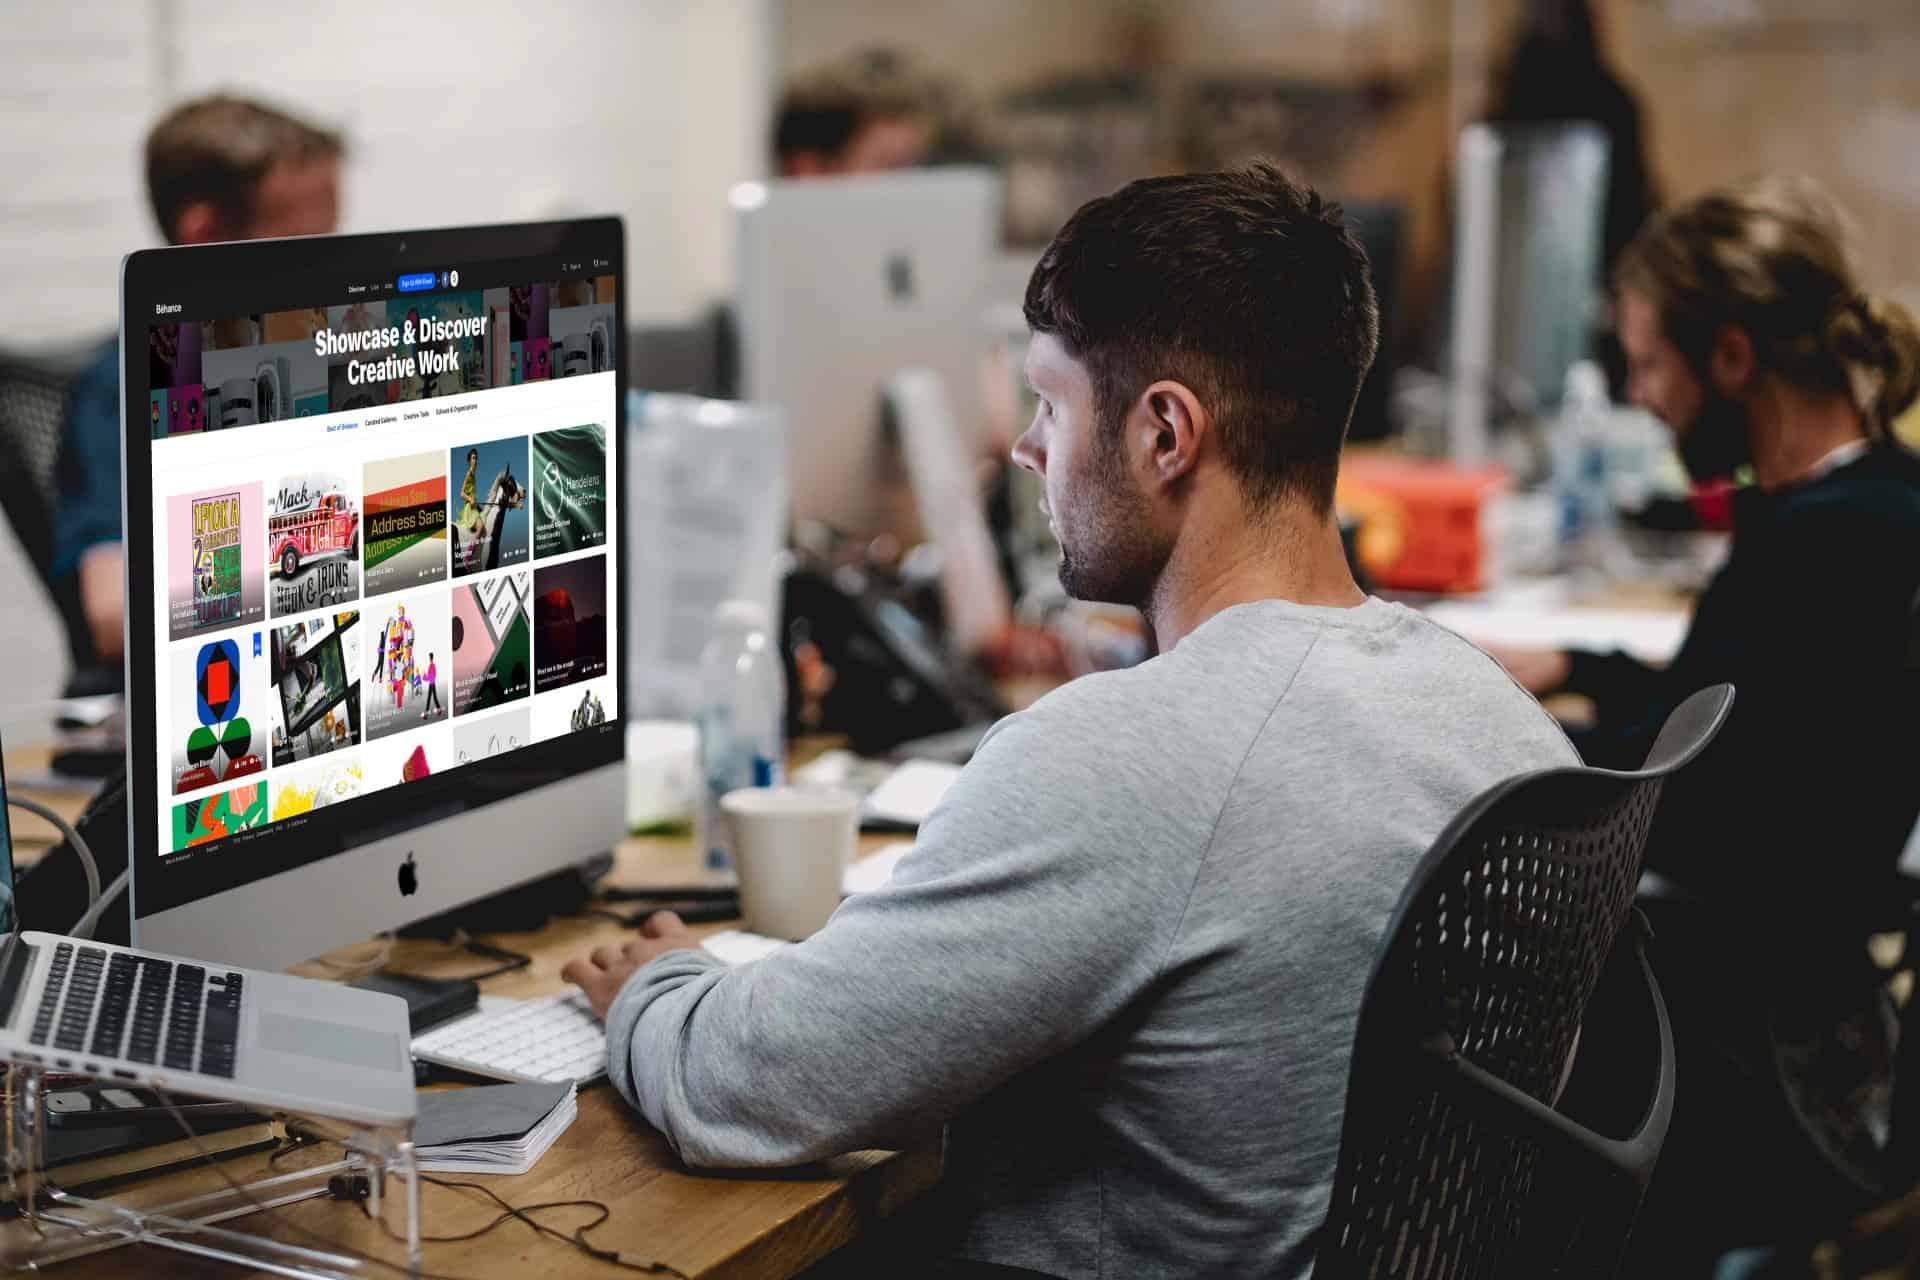 7 Best Desktop Computers For Graphic Design In 2020 Dlc Blog,Pdf Food Product Catalogue Design